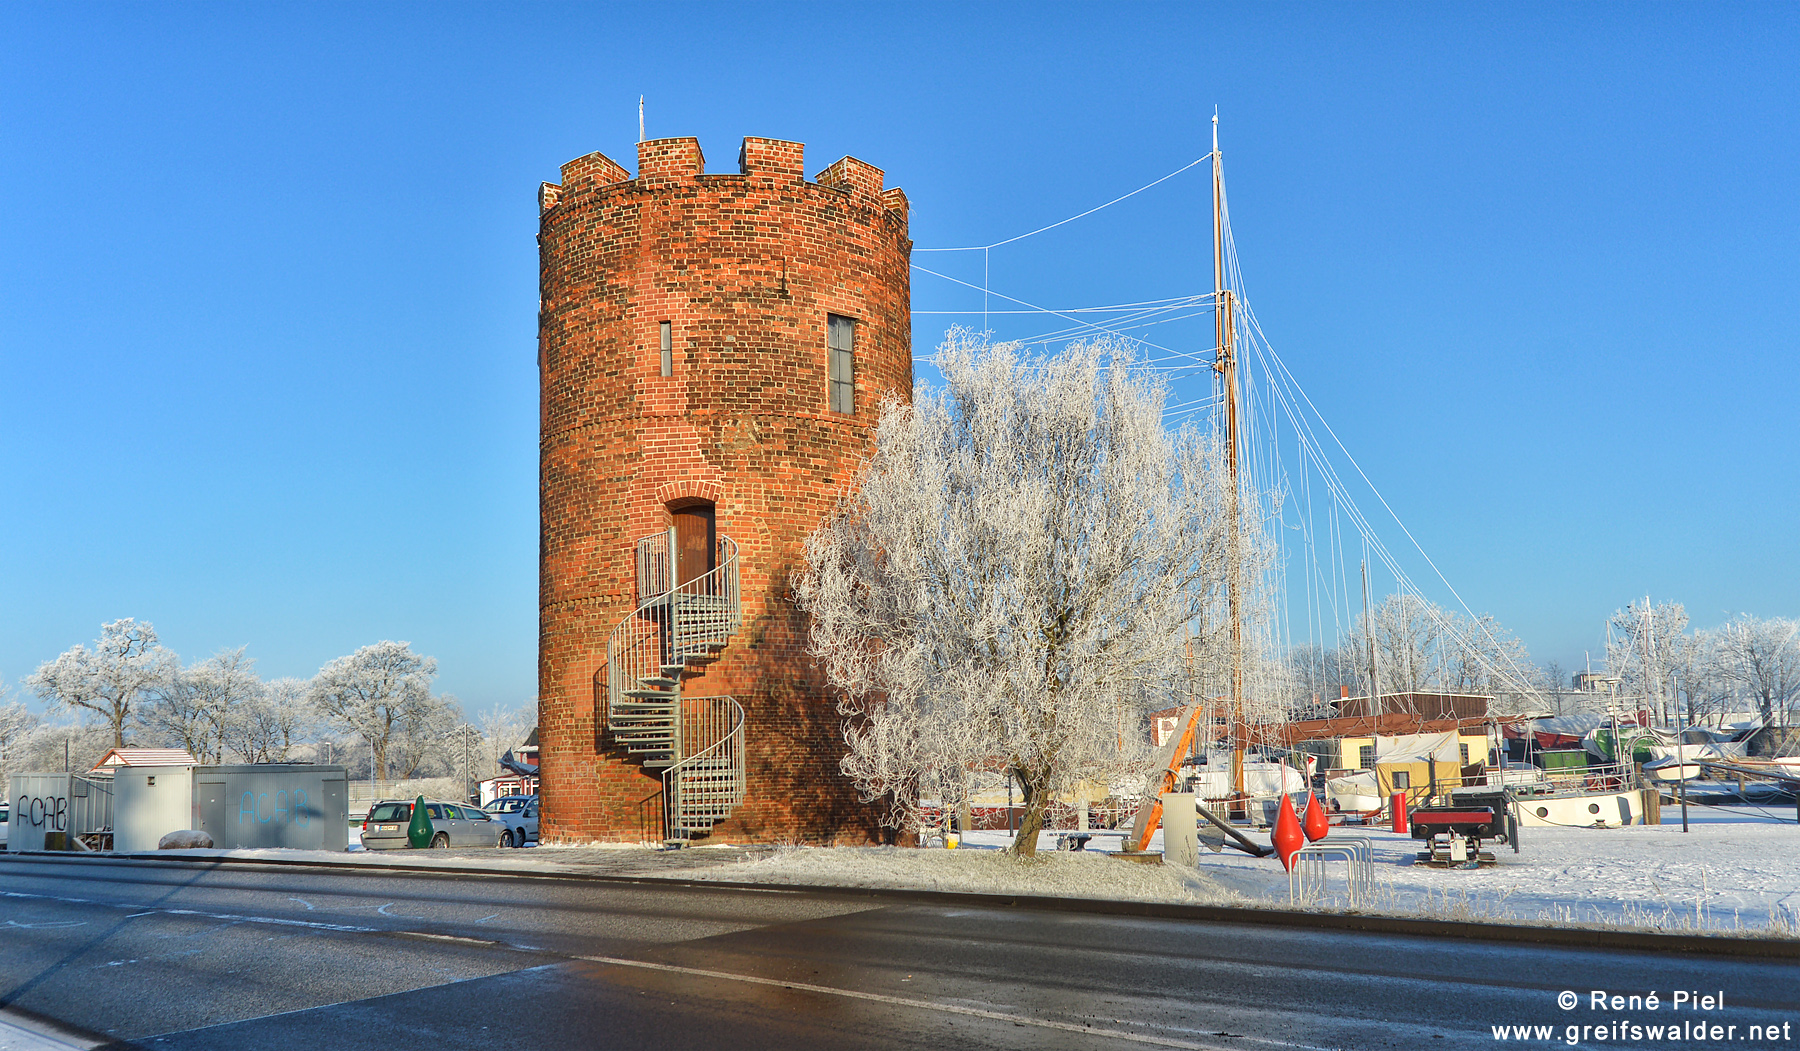 Fangenturm am Museumshafen in Greifswald